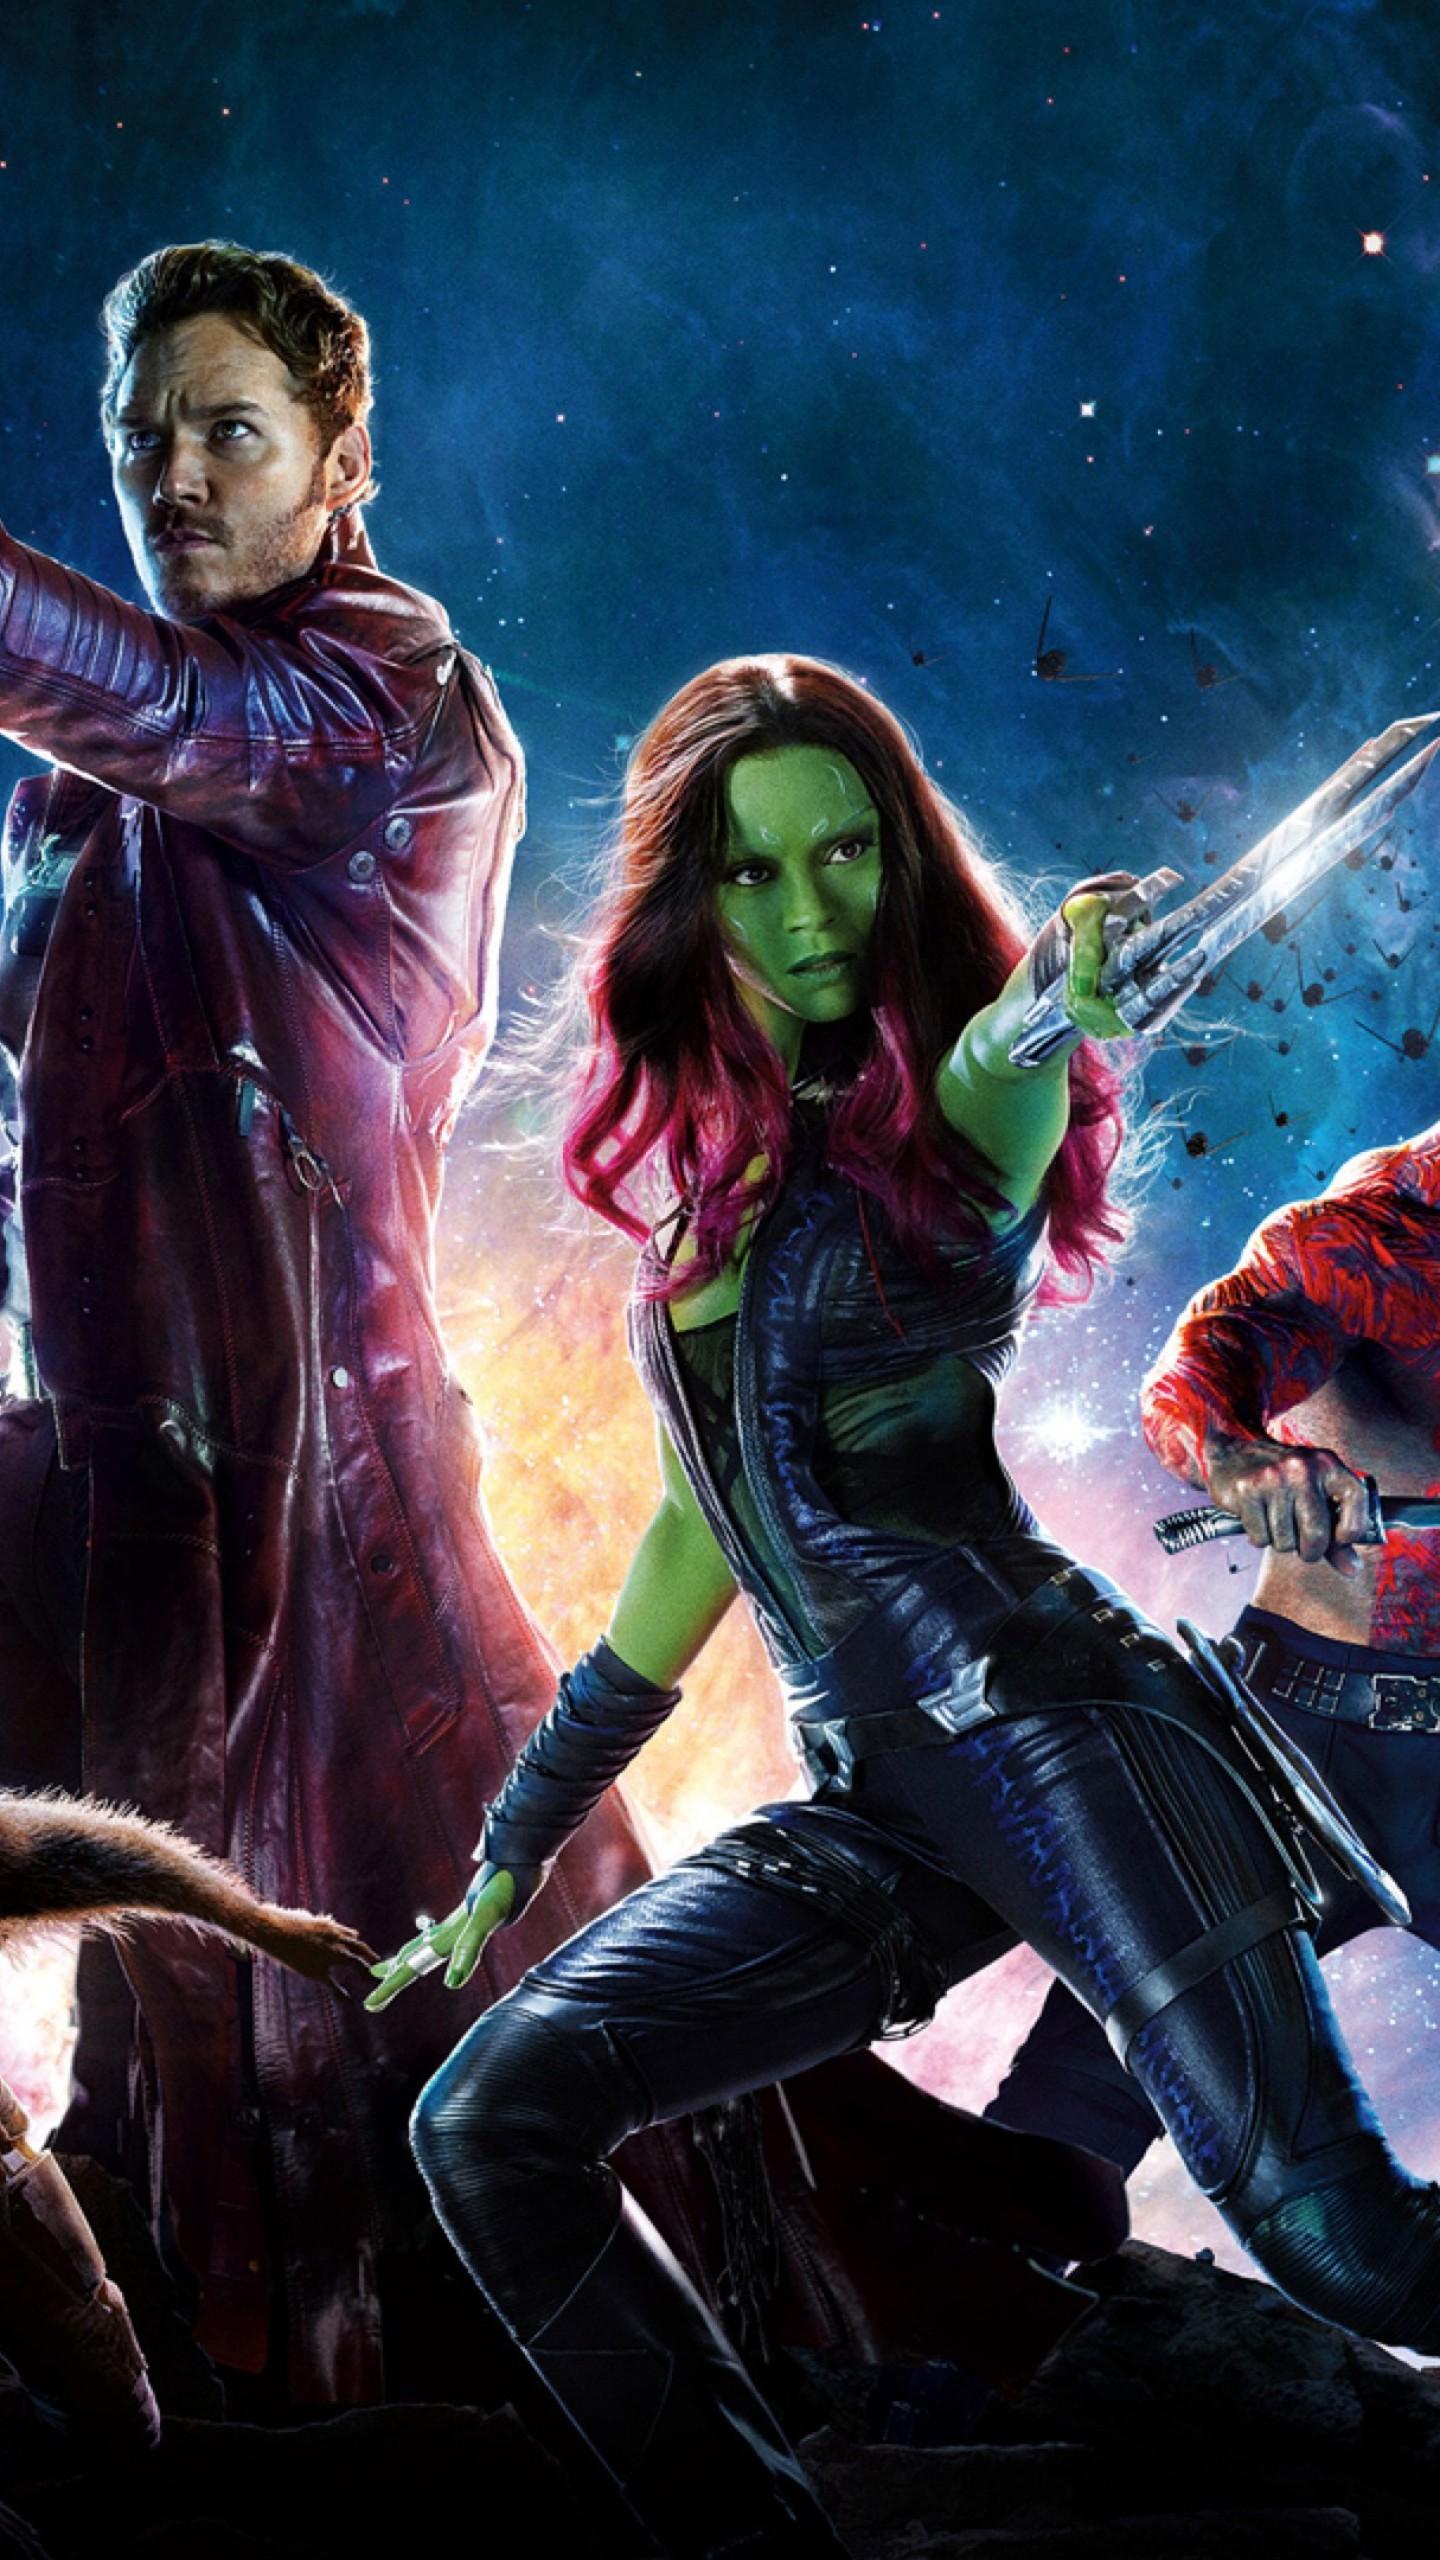 Cool Cars Games >> Wallpaper Guardians of the Galaxy Vol 2, Gamora, raccoon ...